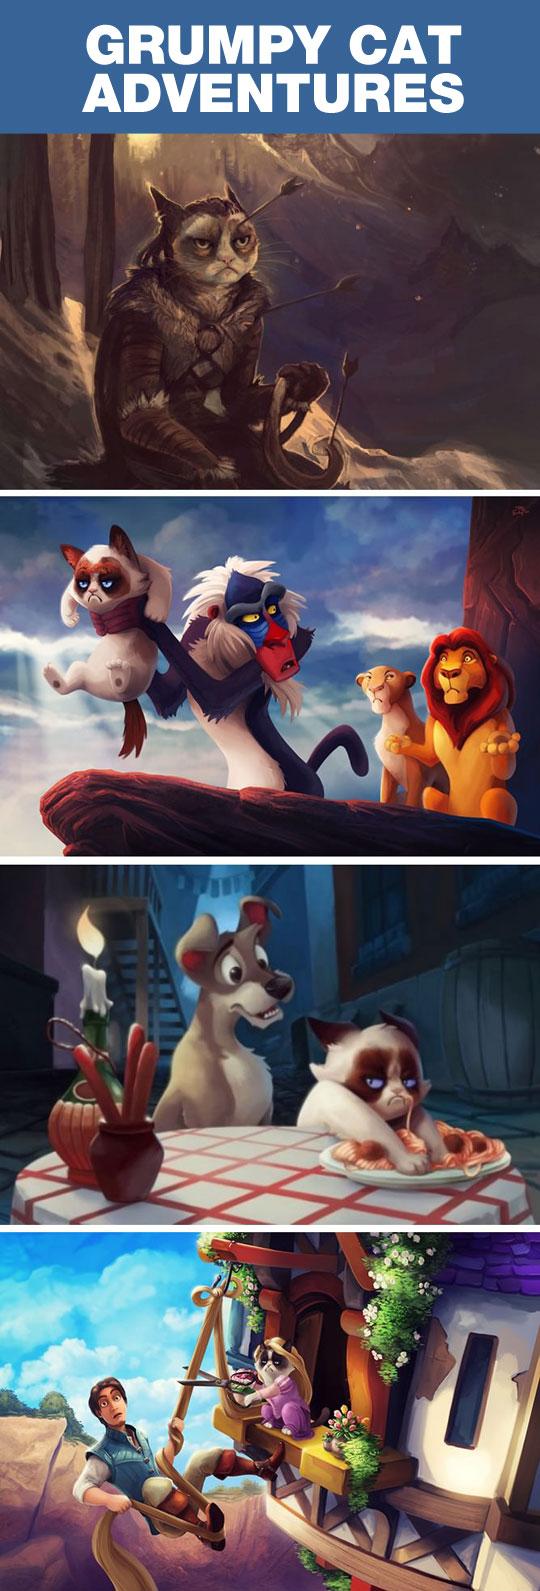 funny-Grumpy-cat-cartoon-adventures-Lion-King